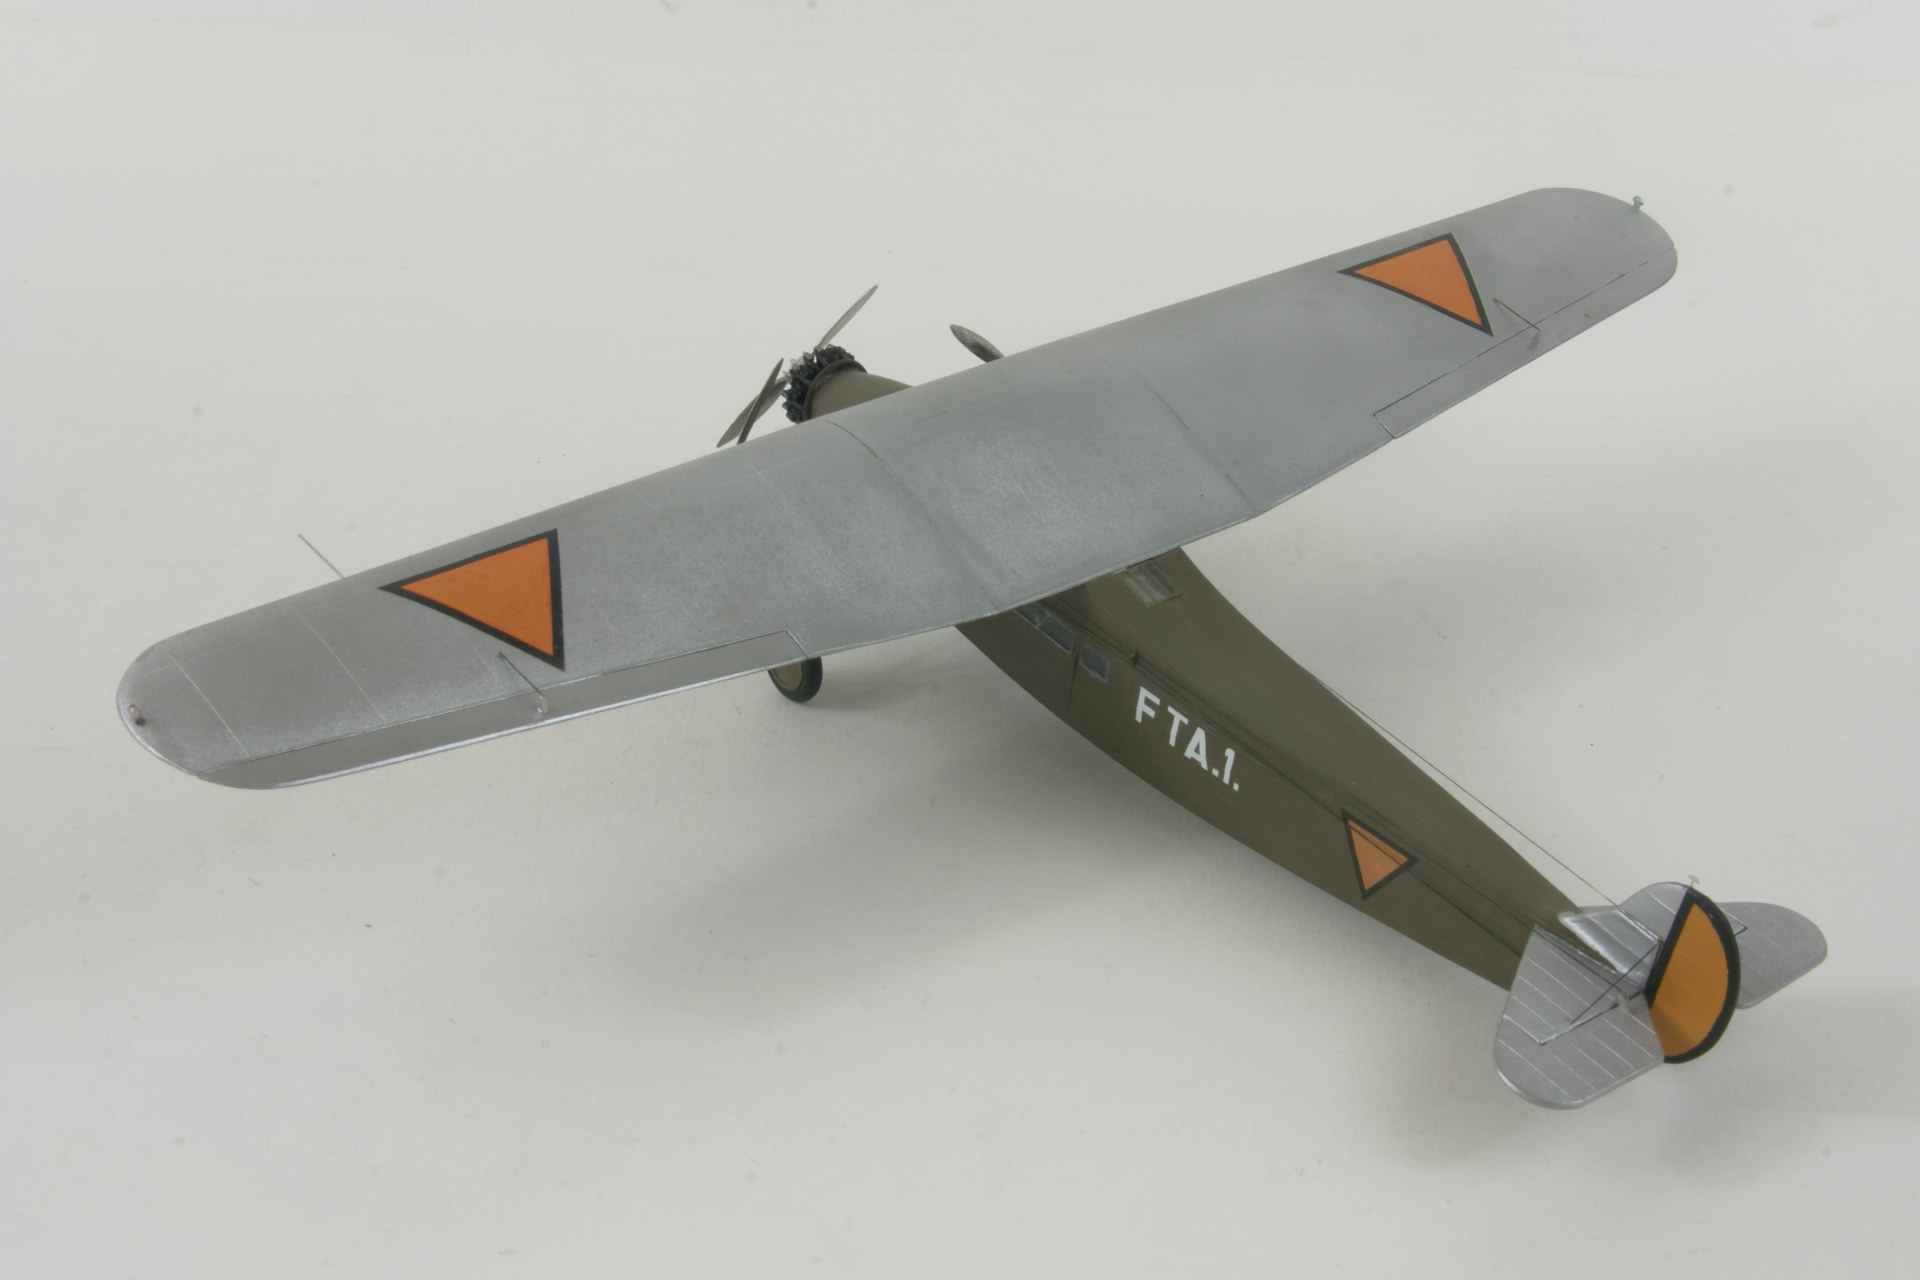 Fokker f viia 2 2